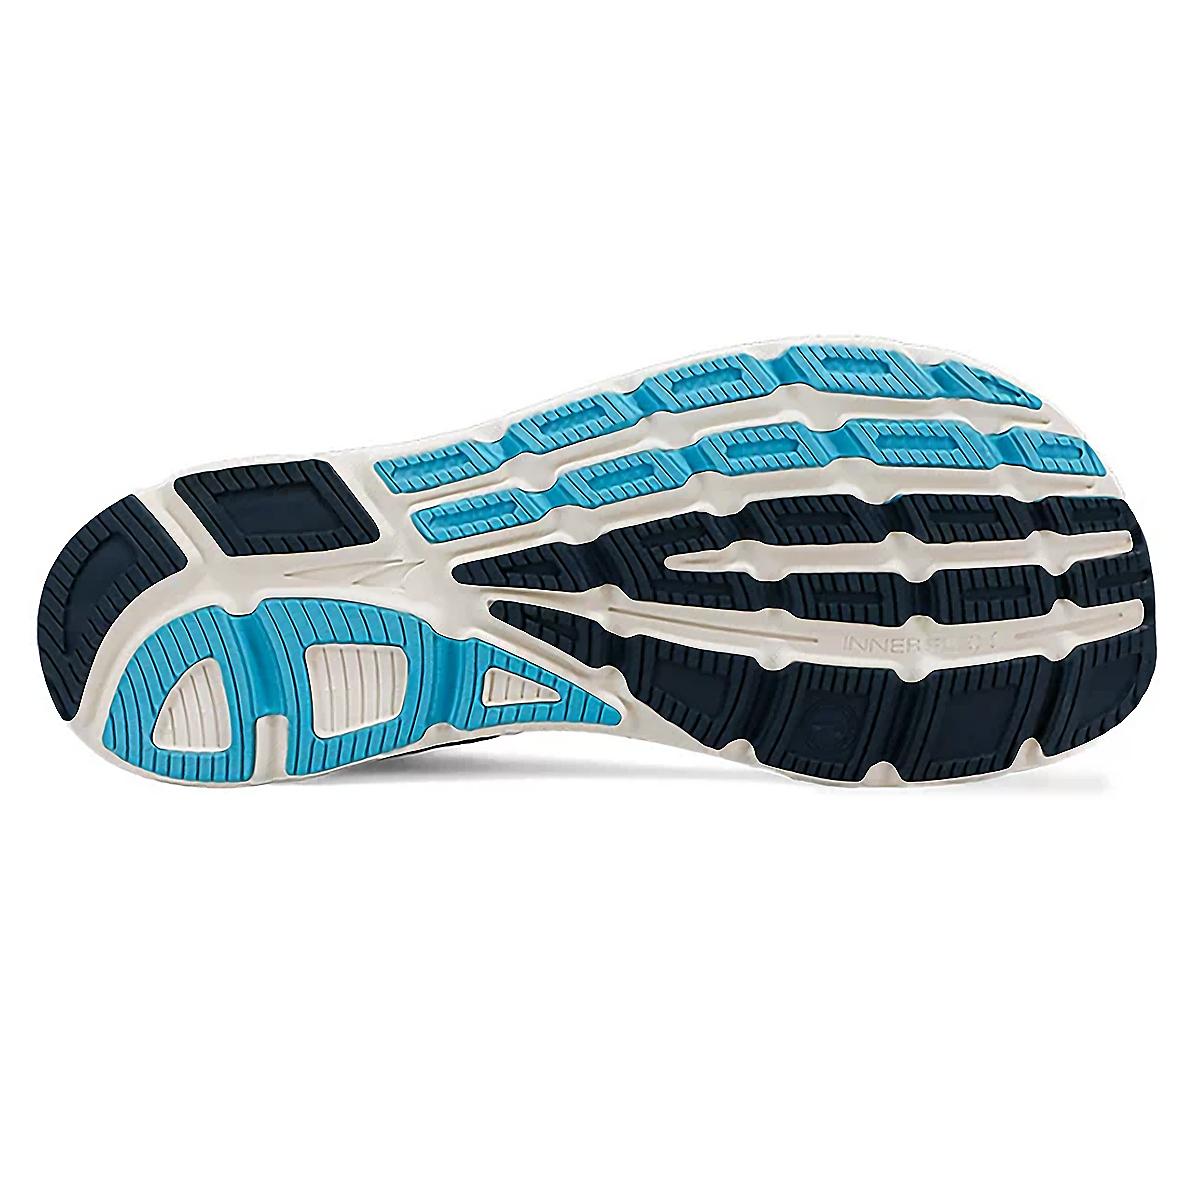 Men's Altra Torin 4.5 Plush Running Shoe - Color: Majolica Blue - Size: 7 - Width: Regular, Majolica Blue, large, image 3